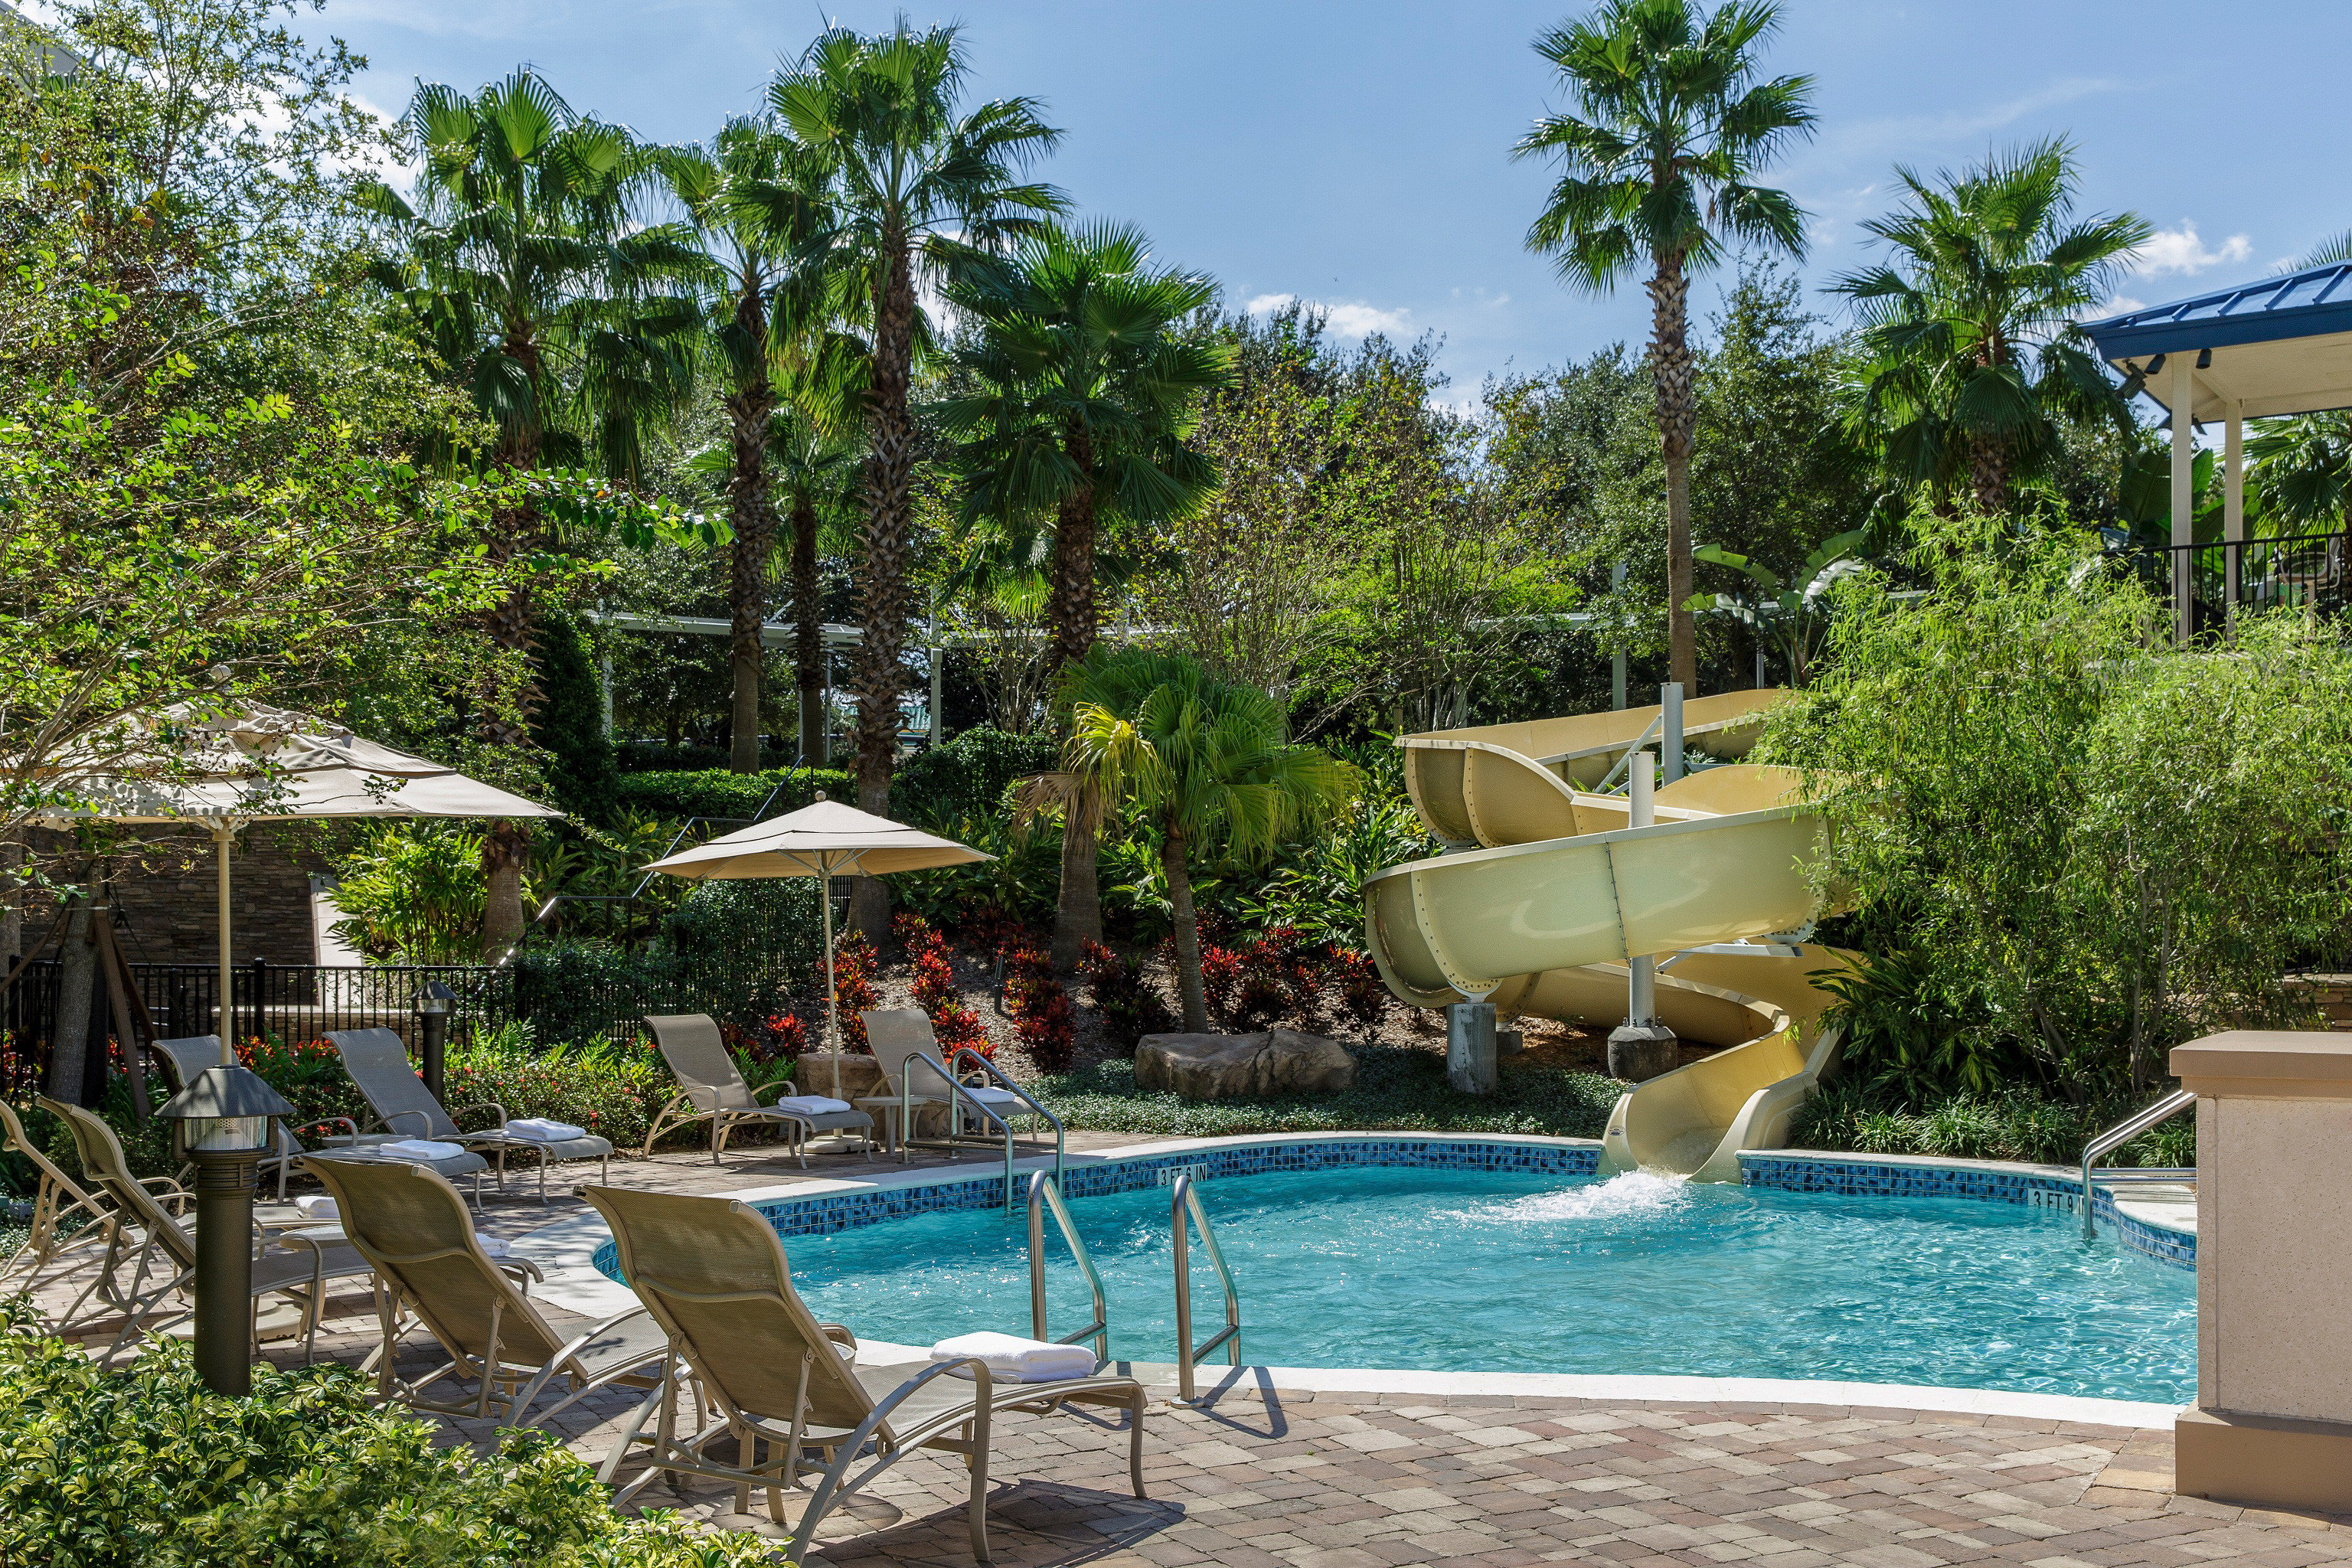 All-inclusive Lounge Play Pool tree sky swimming pool property Resort Picnic condominium backyard Villa Garden lawn eco hotel Deck shade